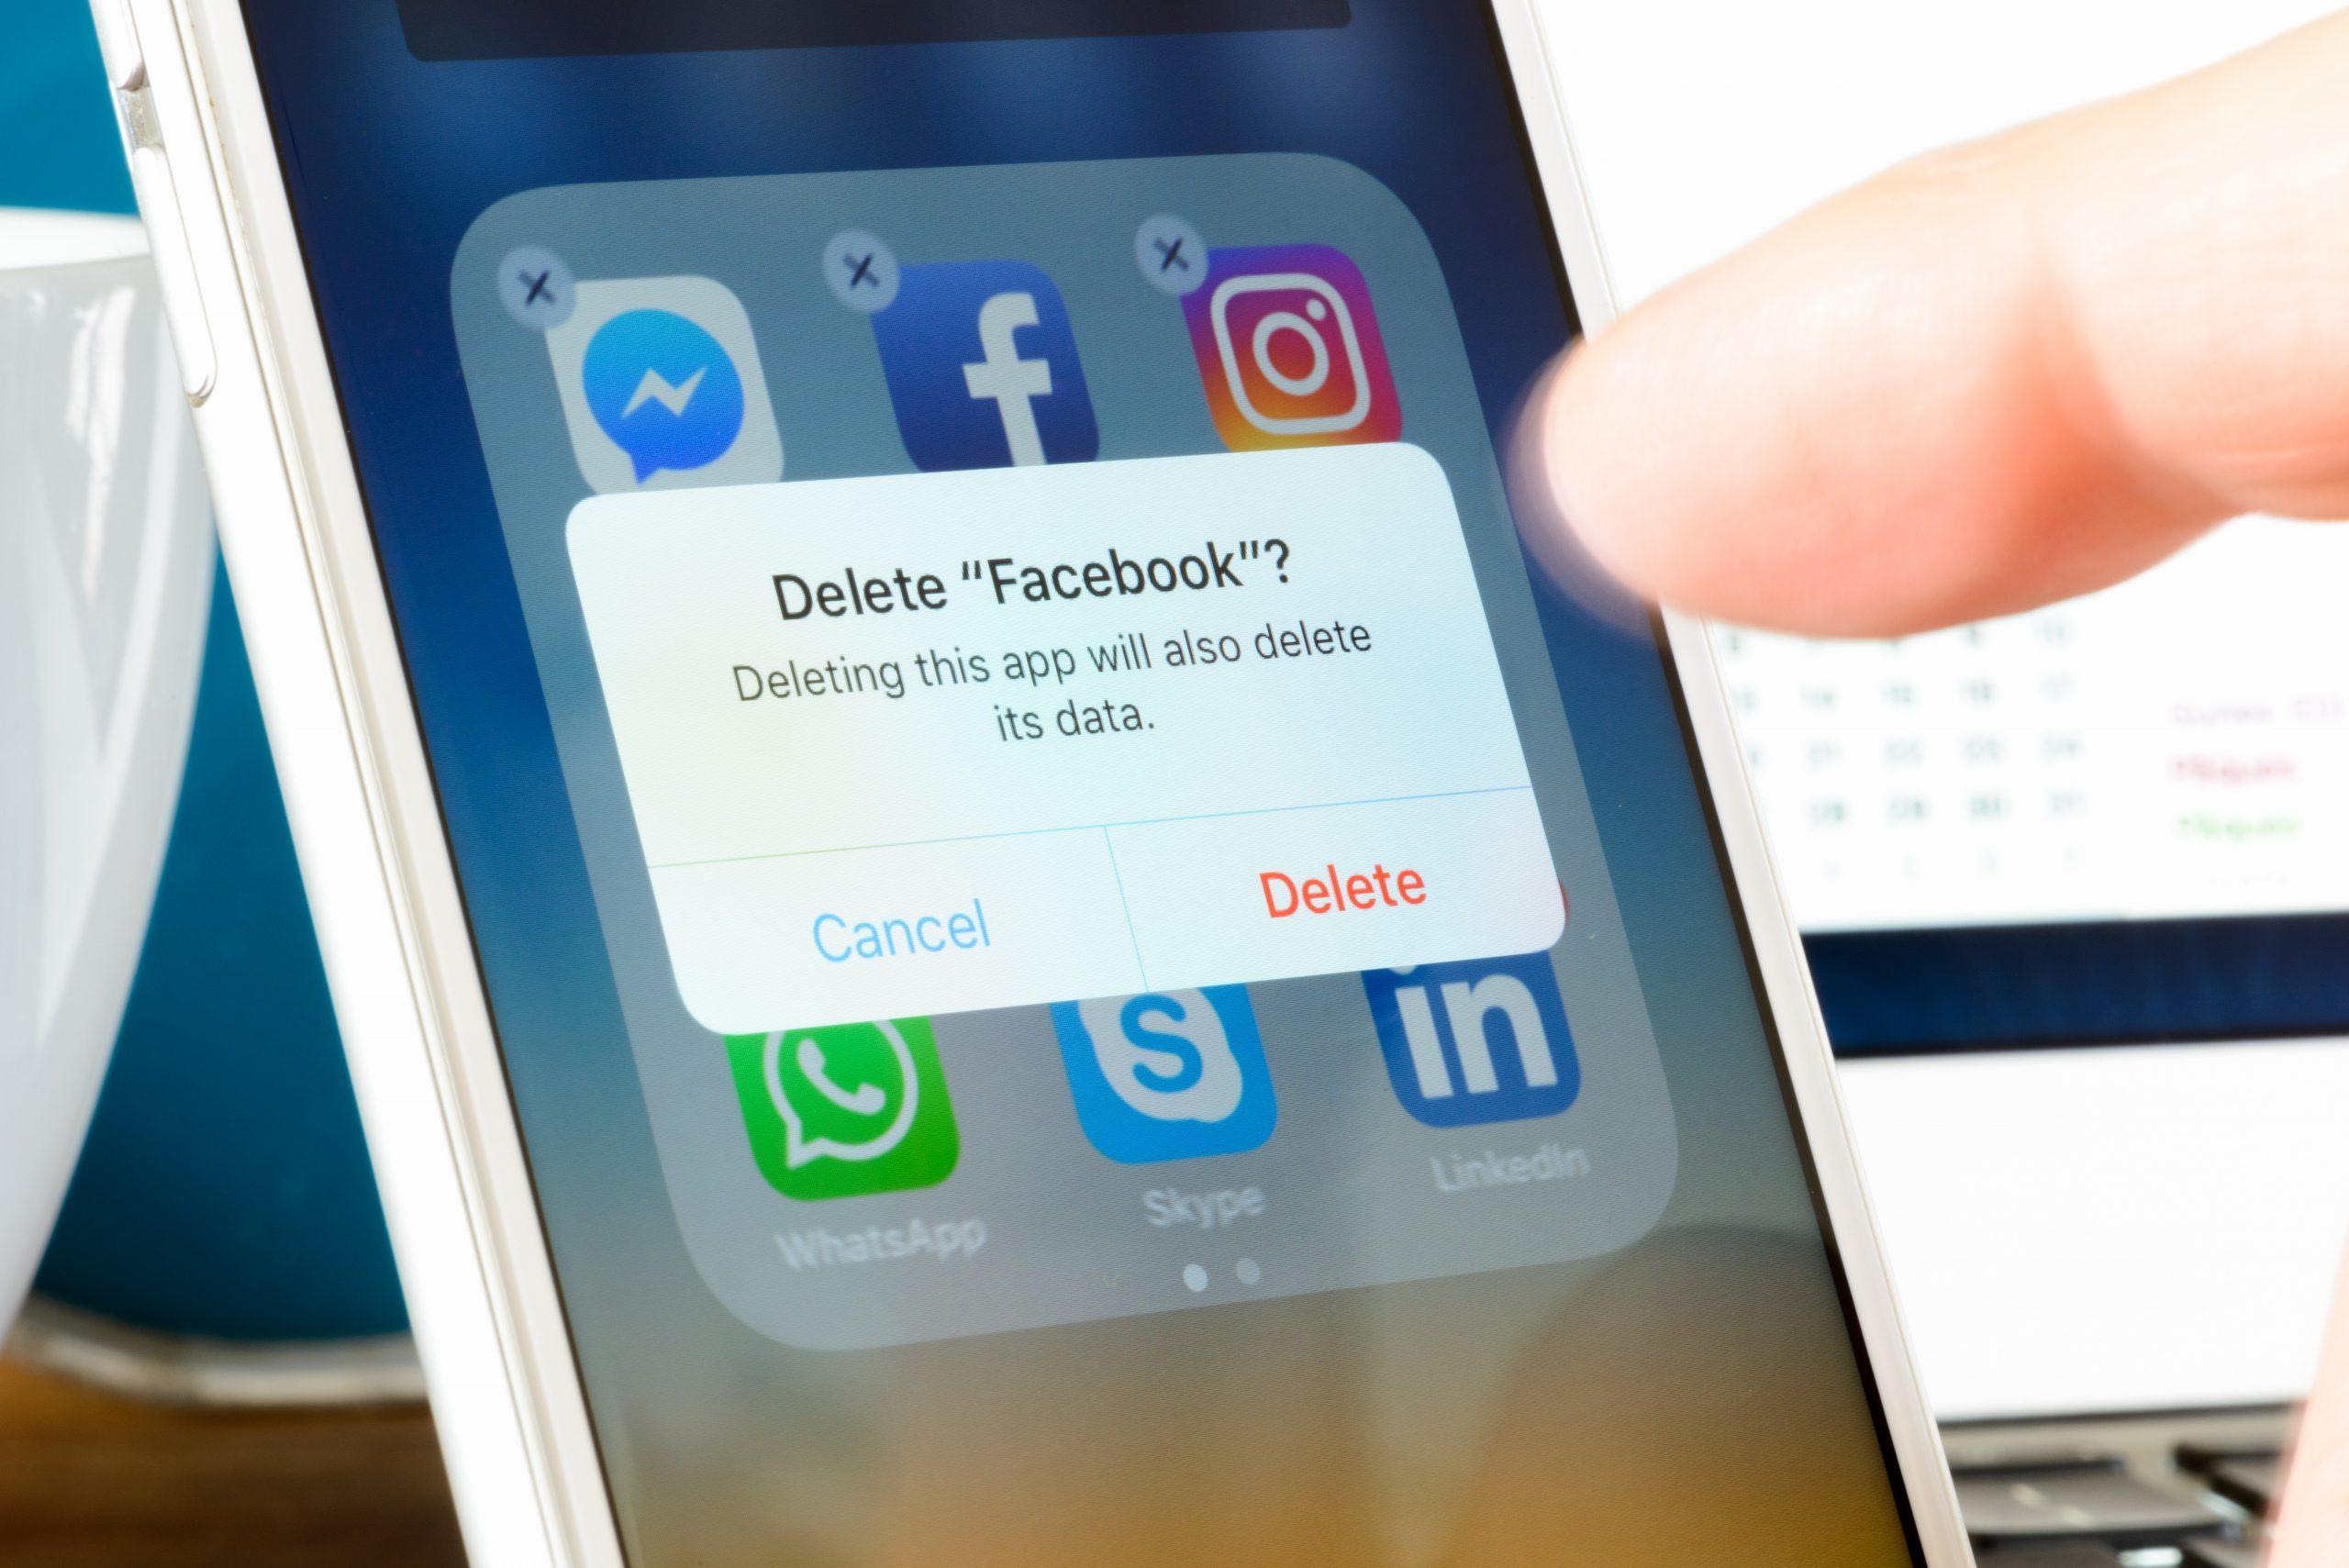 Deleting Facebook App from Smartphone